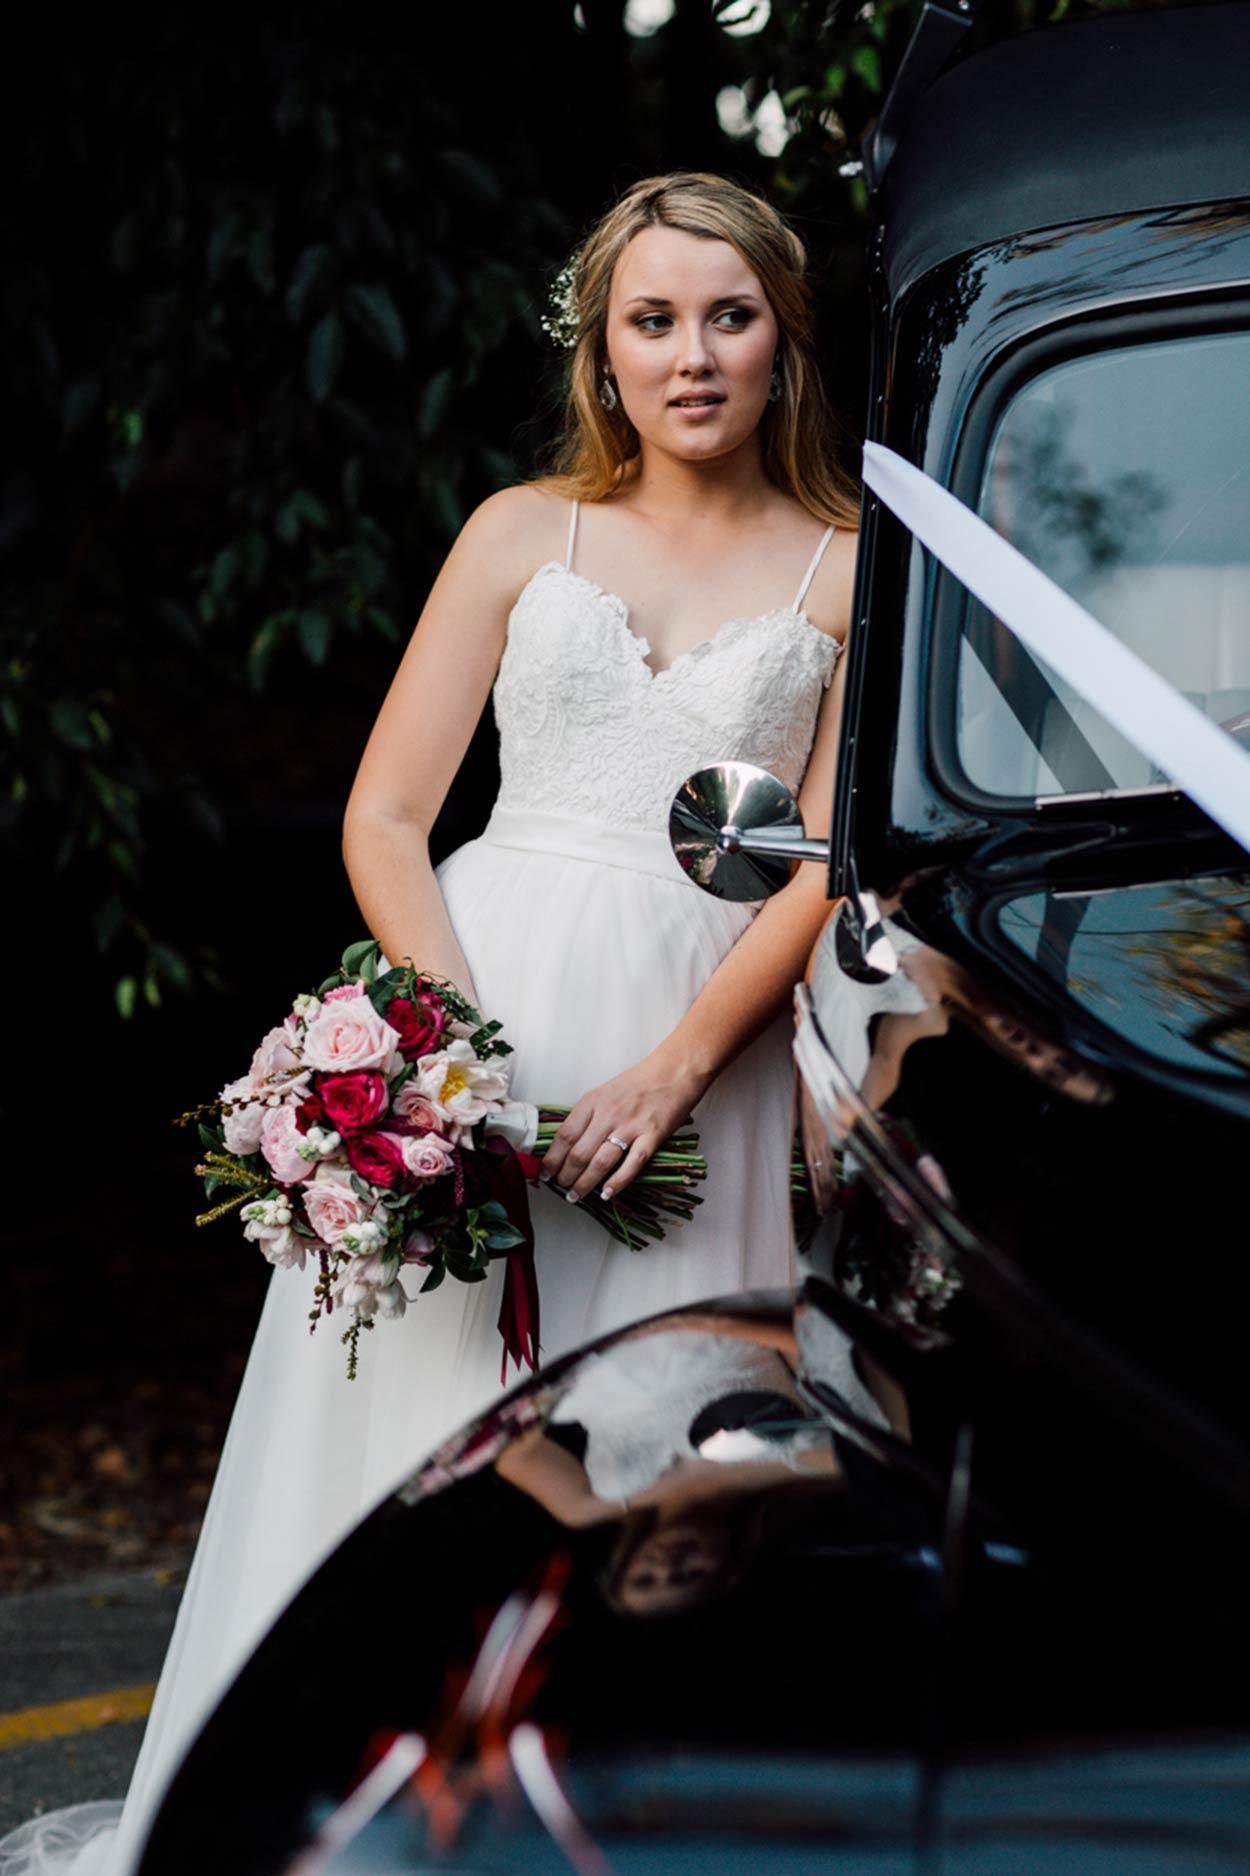 Top Noosa Heads Wedding Portrait Photographer, Sunshine Coast - Sunshine Coast, Queensland, Australian Destination